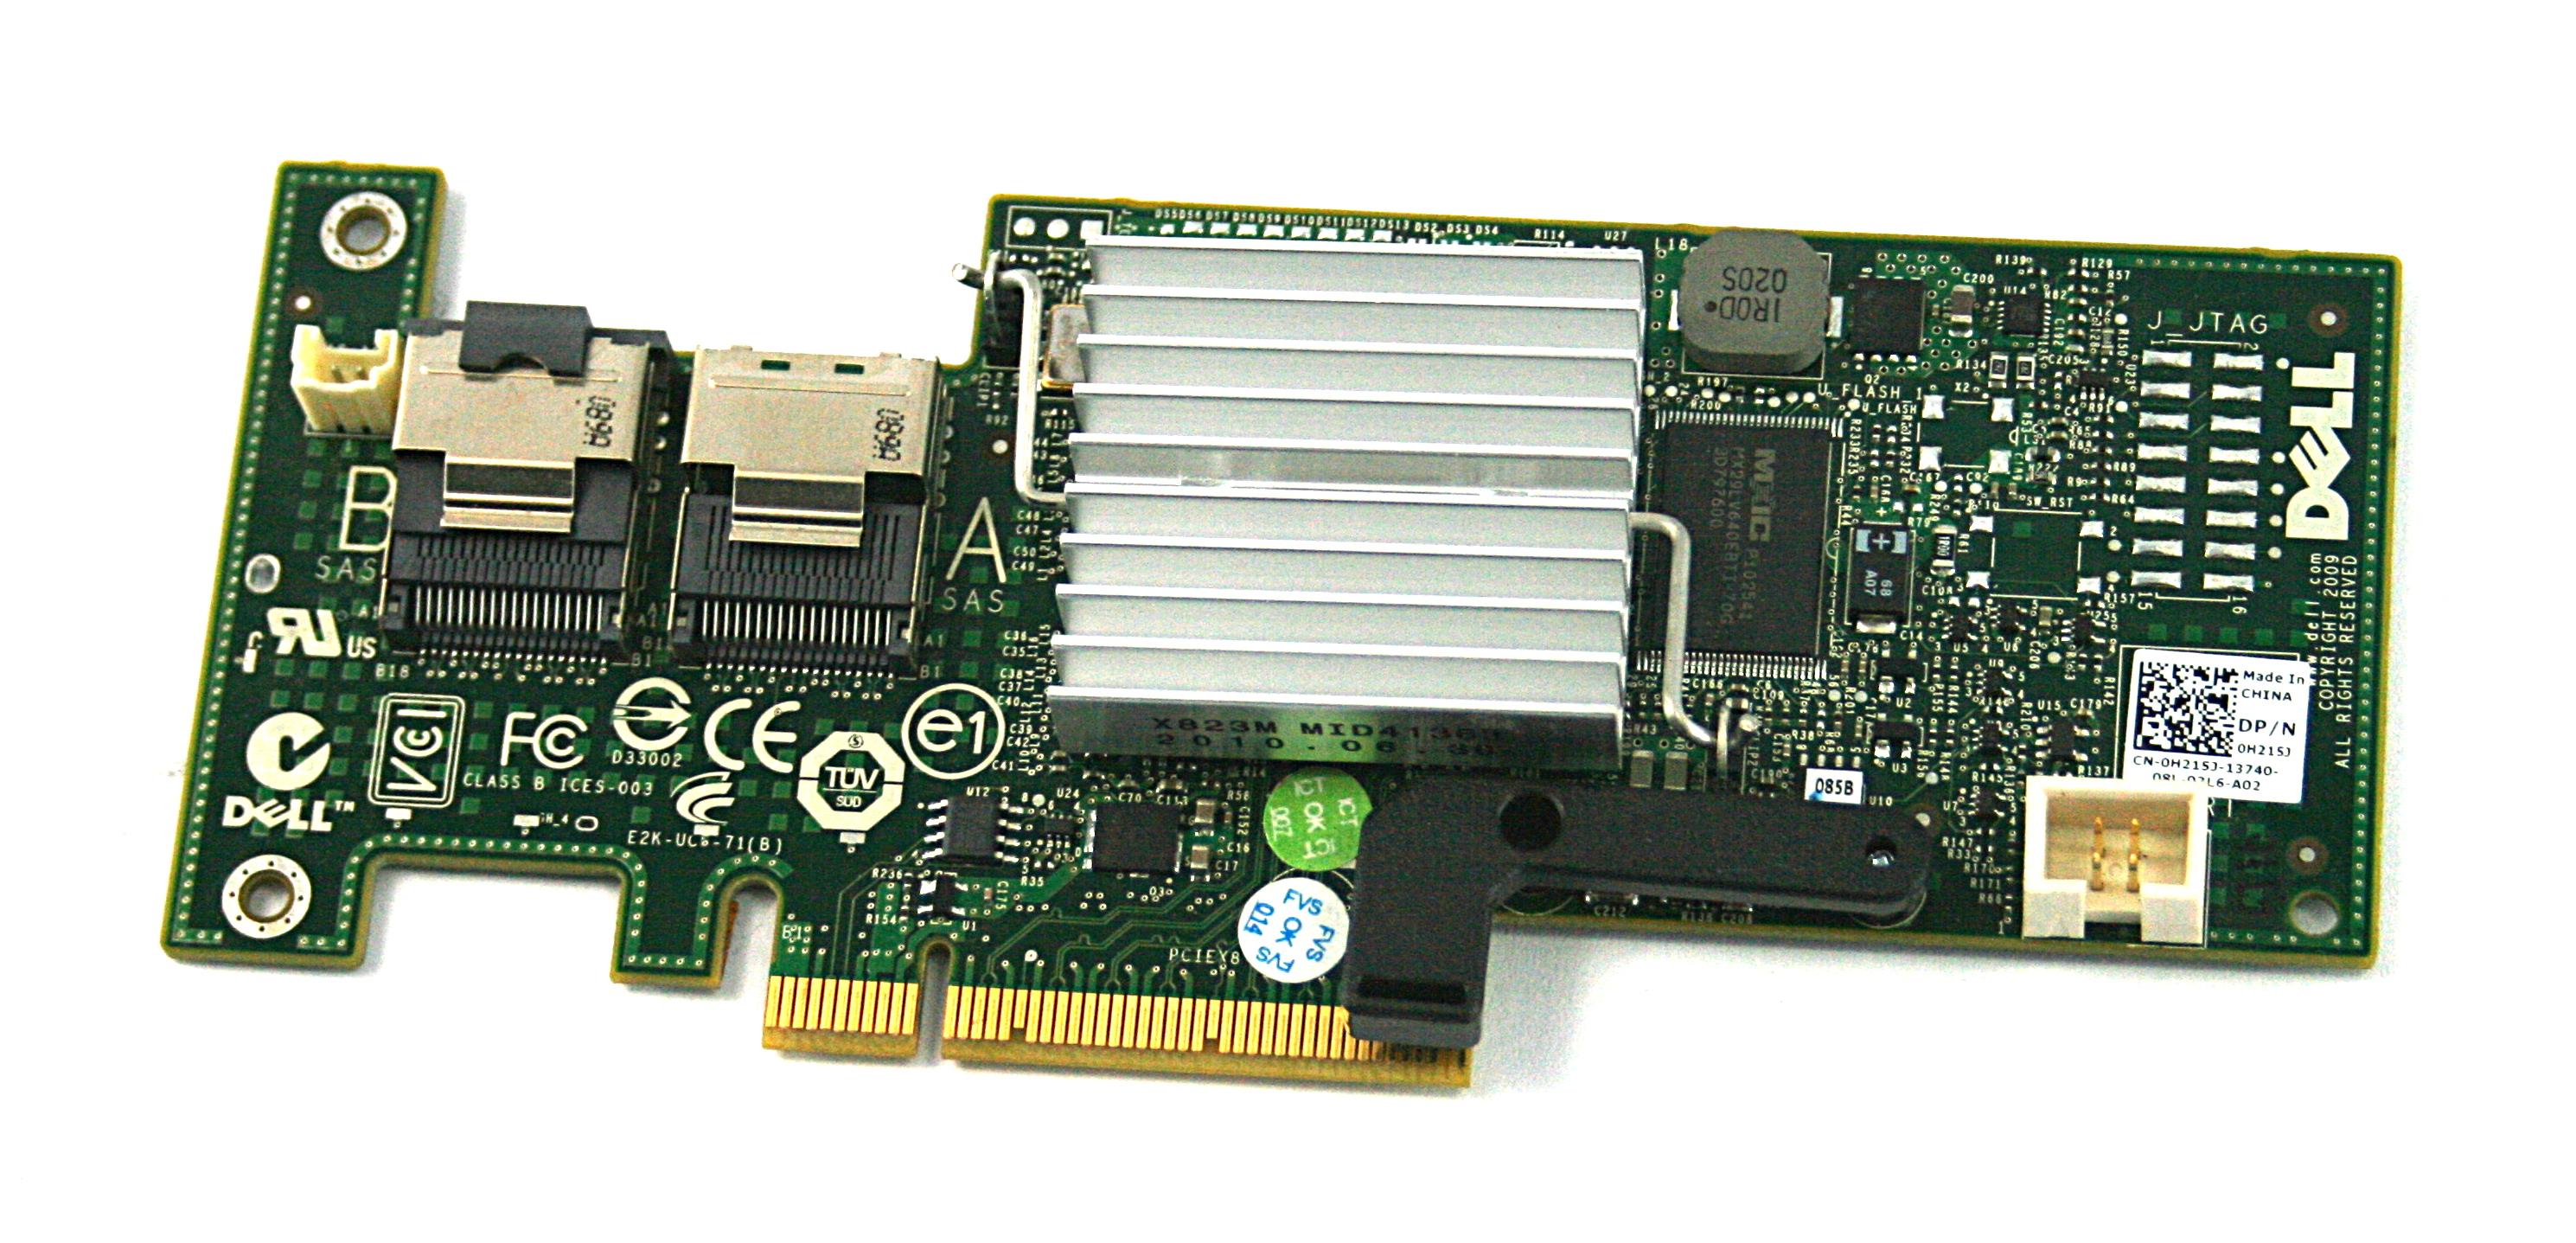 Dell H215J Modular SAS/ SATA RAID Controller Card - Without Bracket